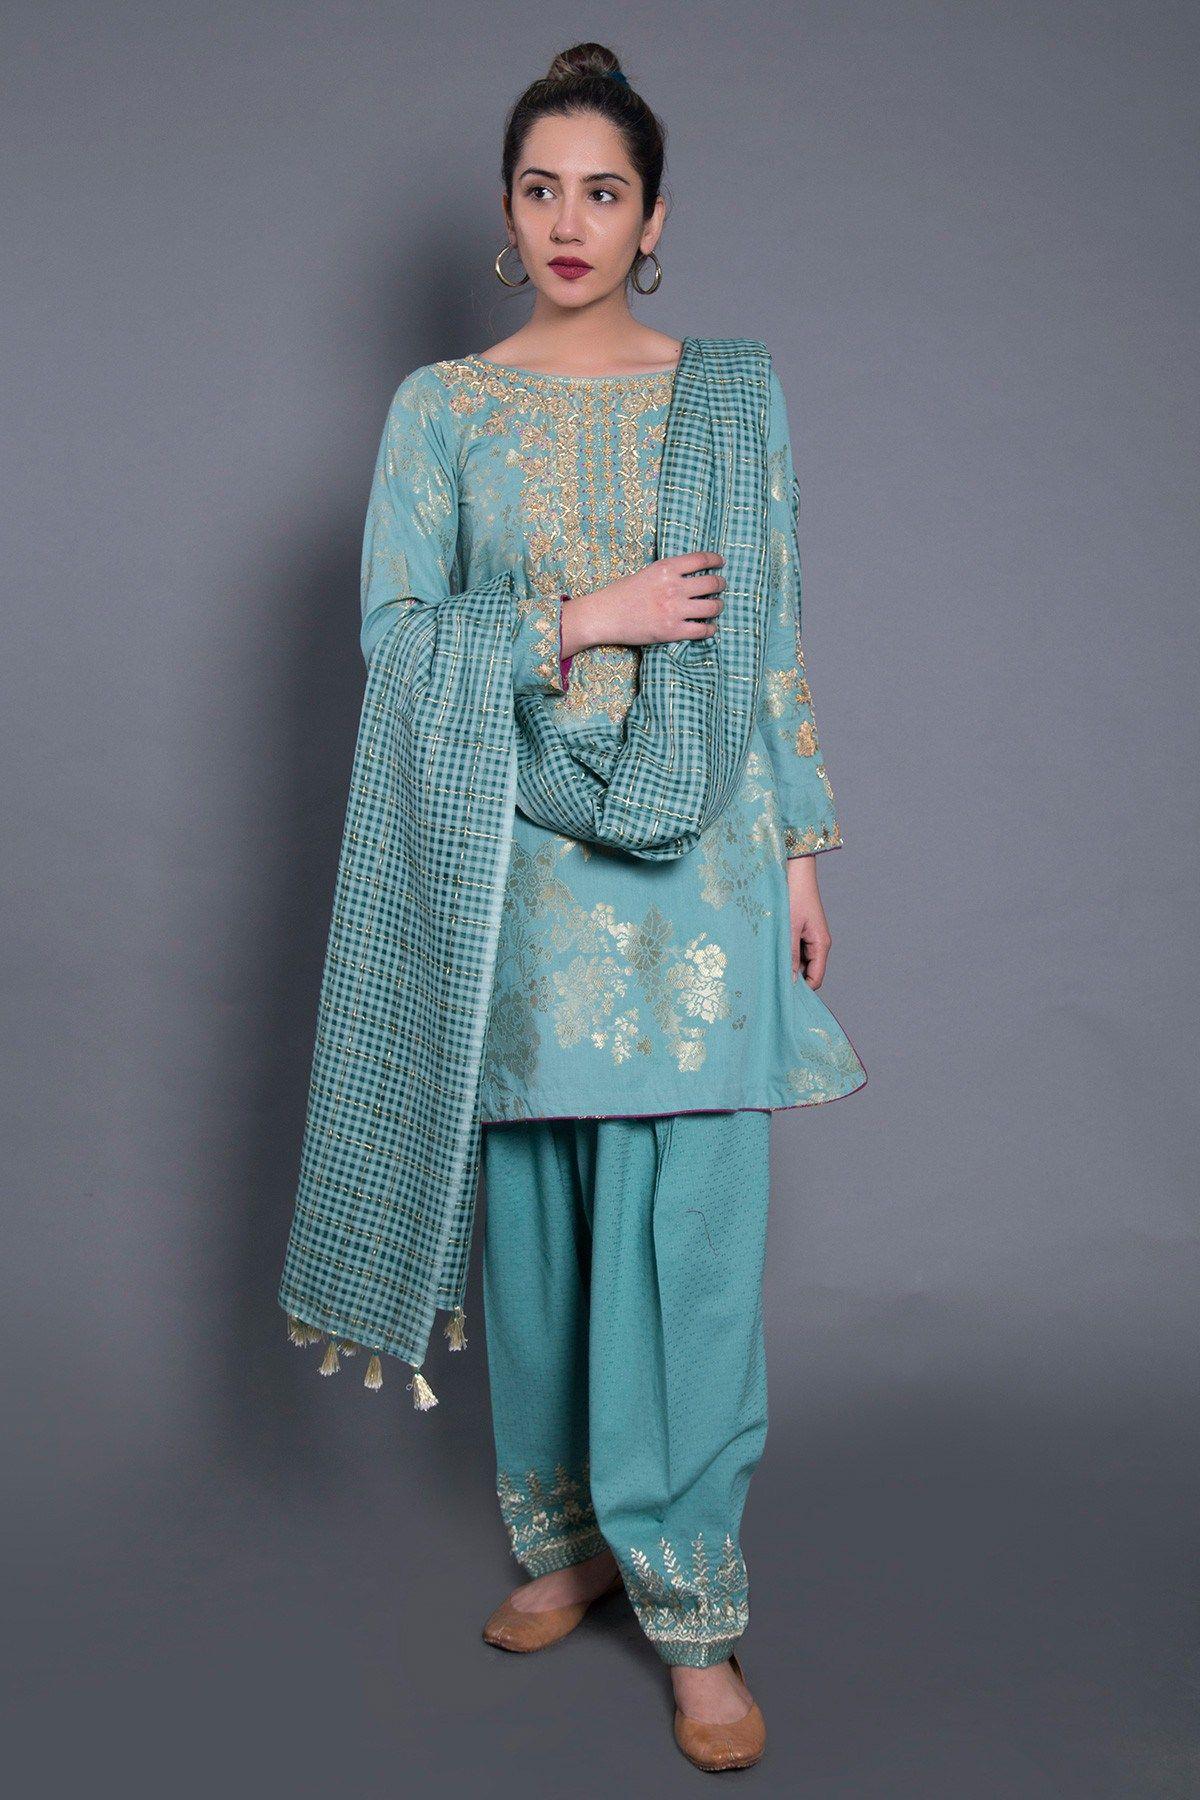 bfb1116ea5a Green 3 piece ready to wear dress by Generation formal wear 2019 ...